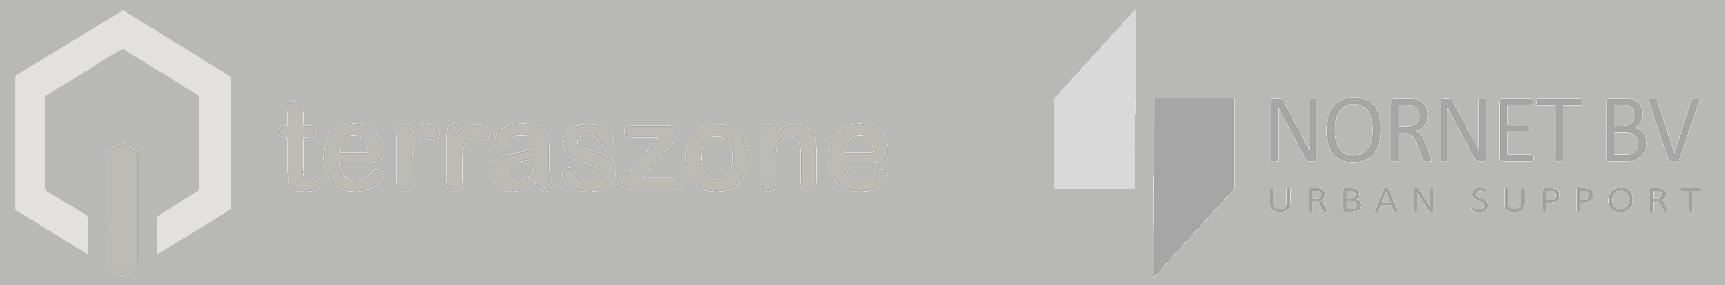 Nornet_Terraszon-Logo-2021